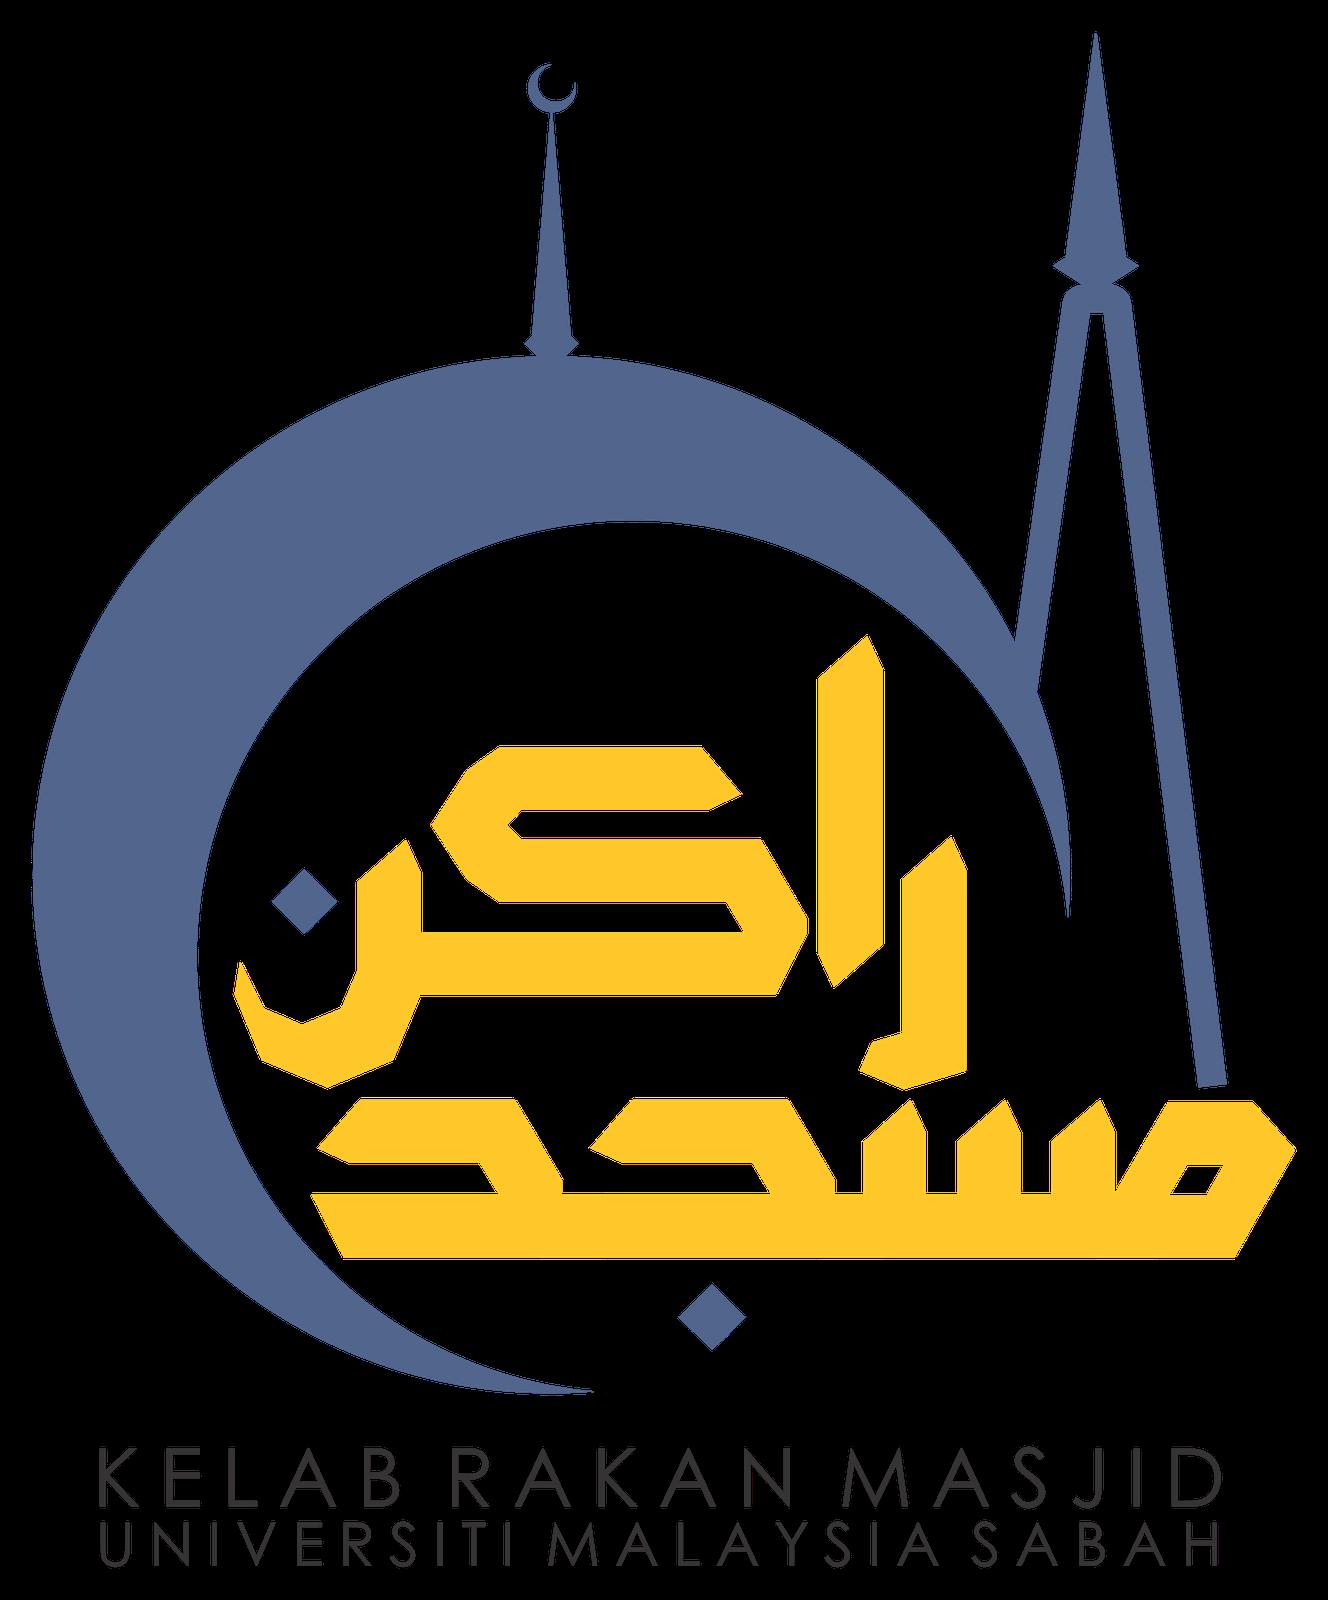 Kelab Rakan Masjid UMS